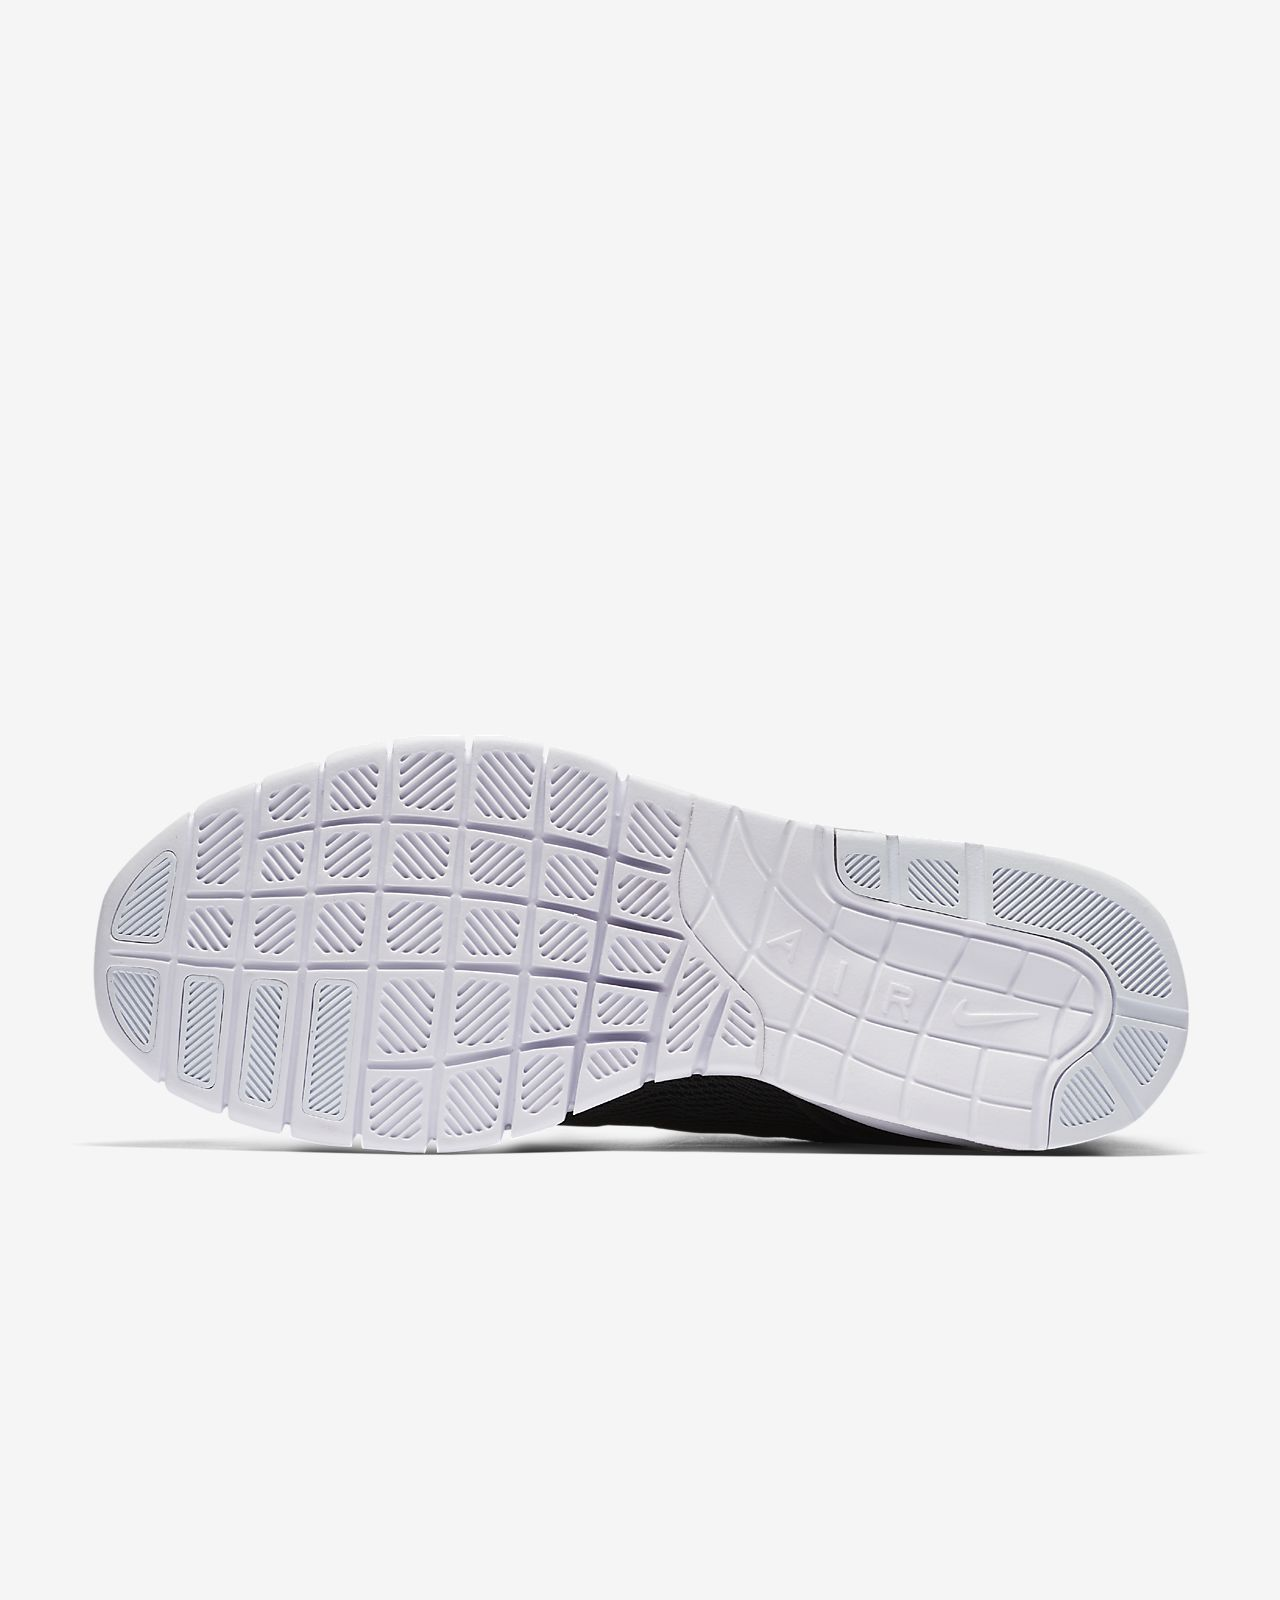 new style 9358a d0e70 ... Chaussure de skateboard Nike SB Stefan Janoski Max